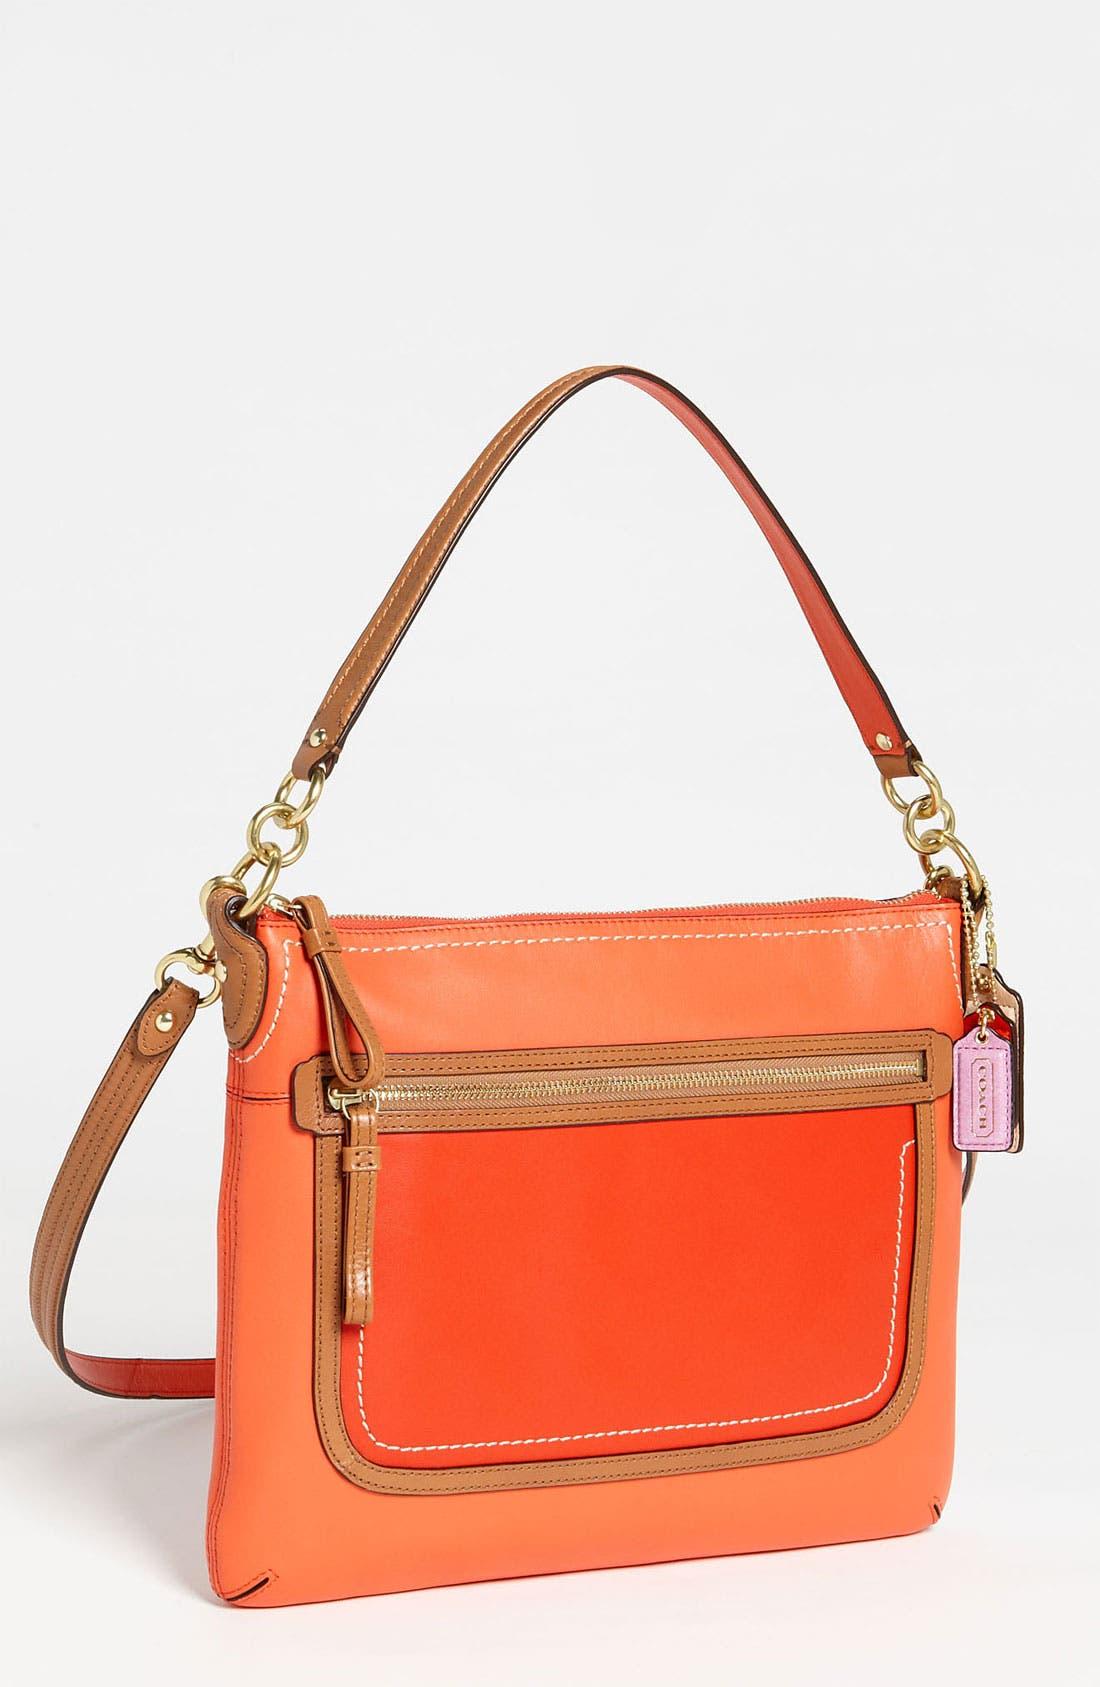 Alternate Image 1 Selected - COACH 'Poppy Colorblock' Shoulder Bag